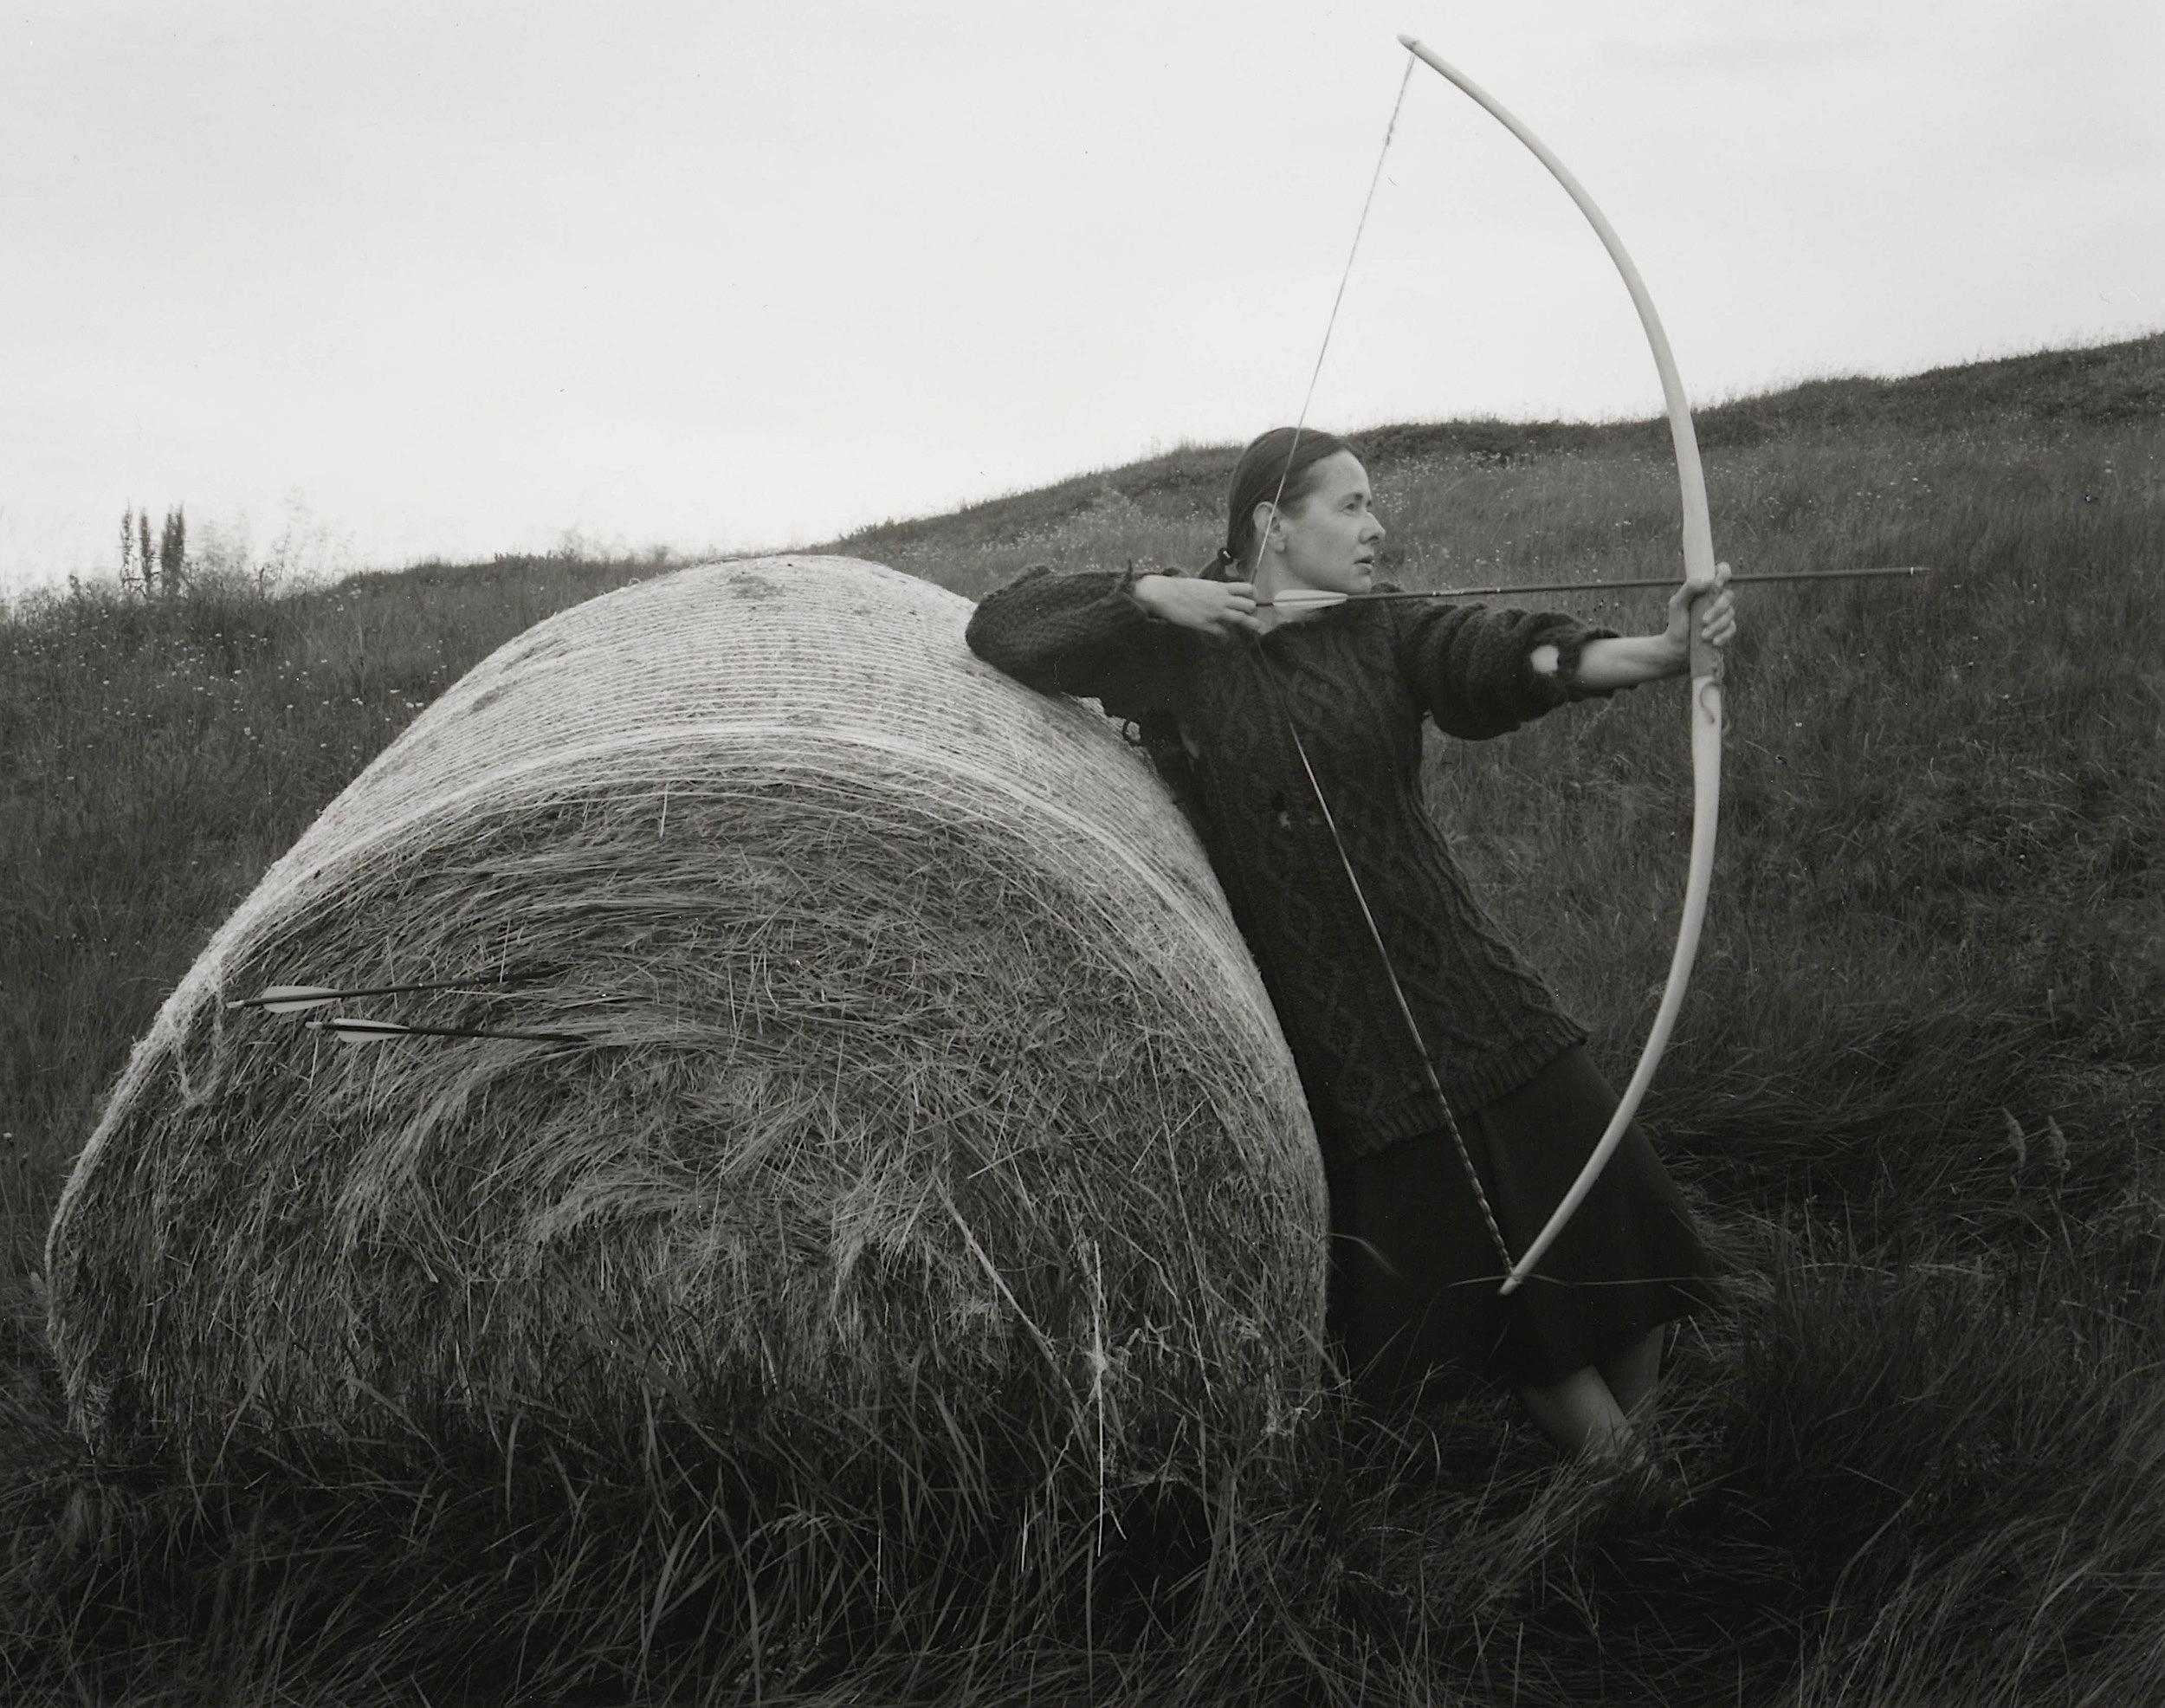 05_Longbow Practice. Self Portrait.Kleppjárnsstaðir, Iceland. 2018.jpg